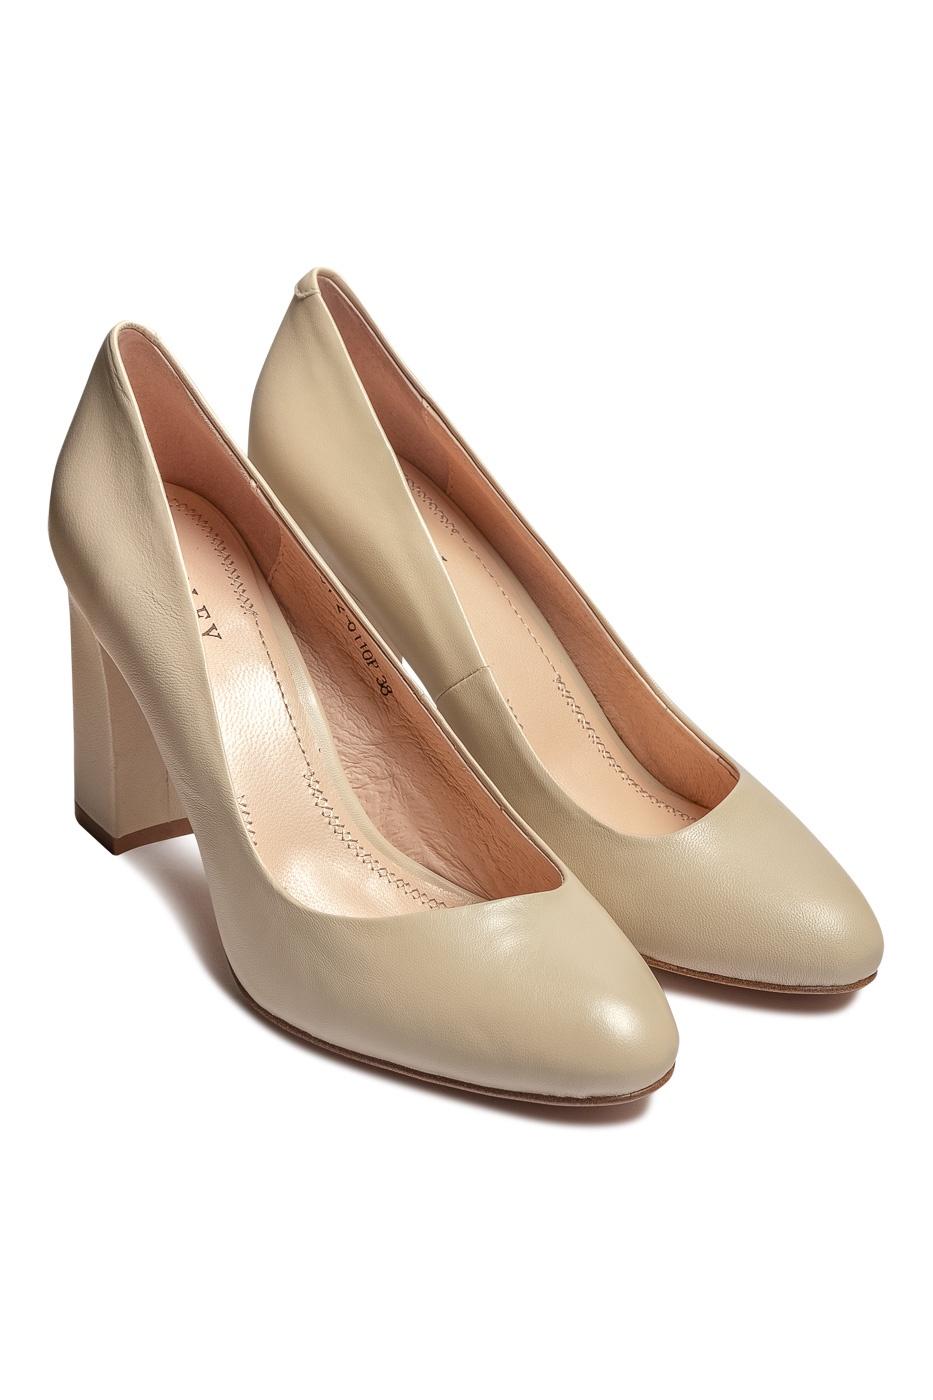 Туфли Valley туфли женские inario цвет светло бежевый 17127 01 4 размер 40